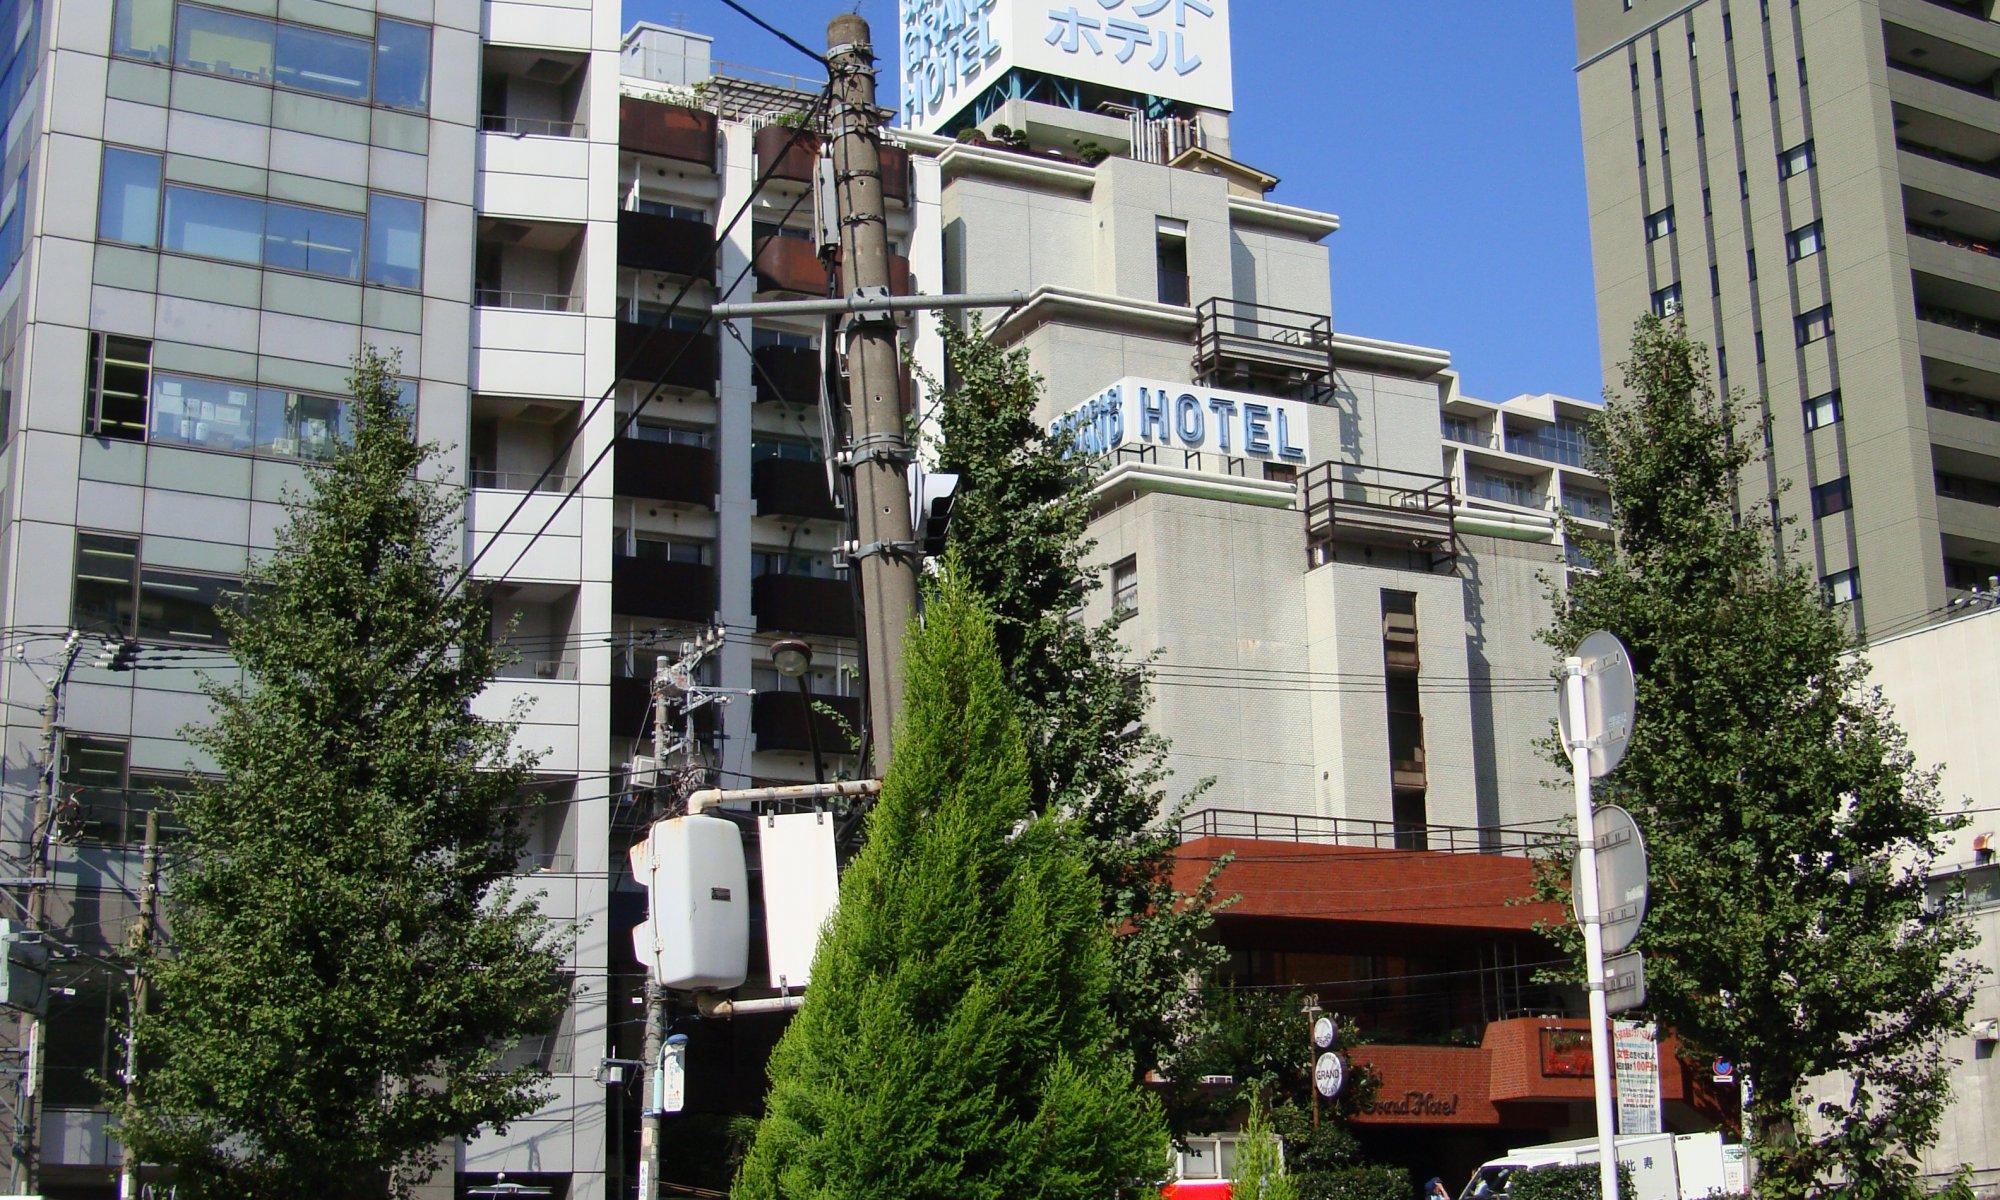 Suidobashi Grand Hotel, Tōkyō, Japan